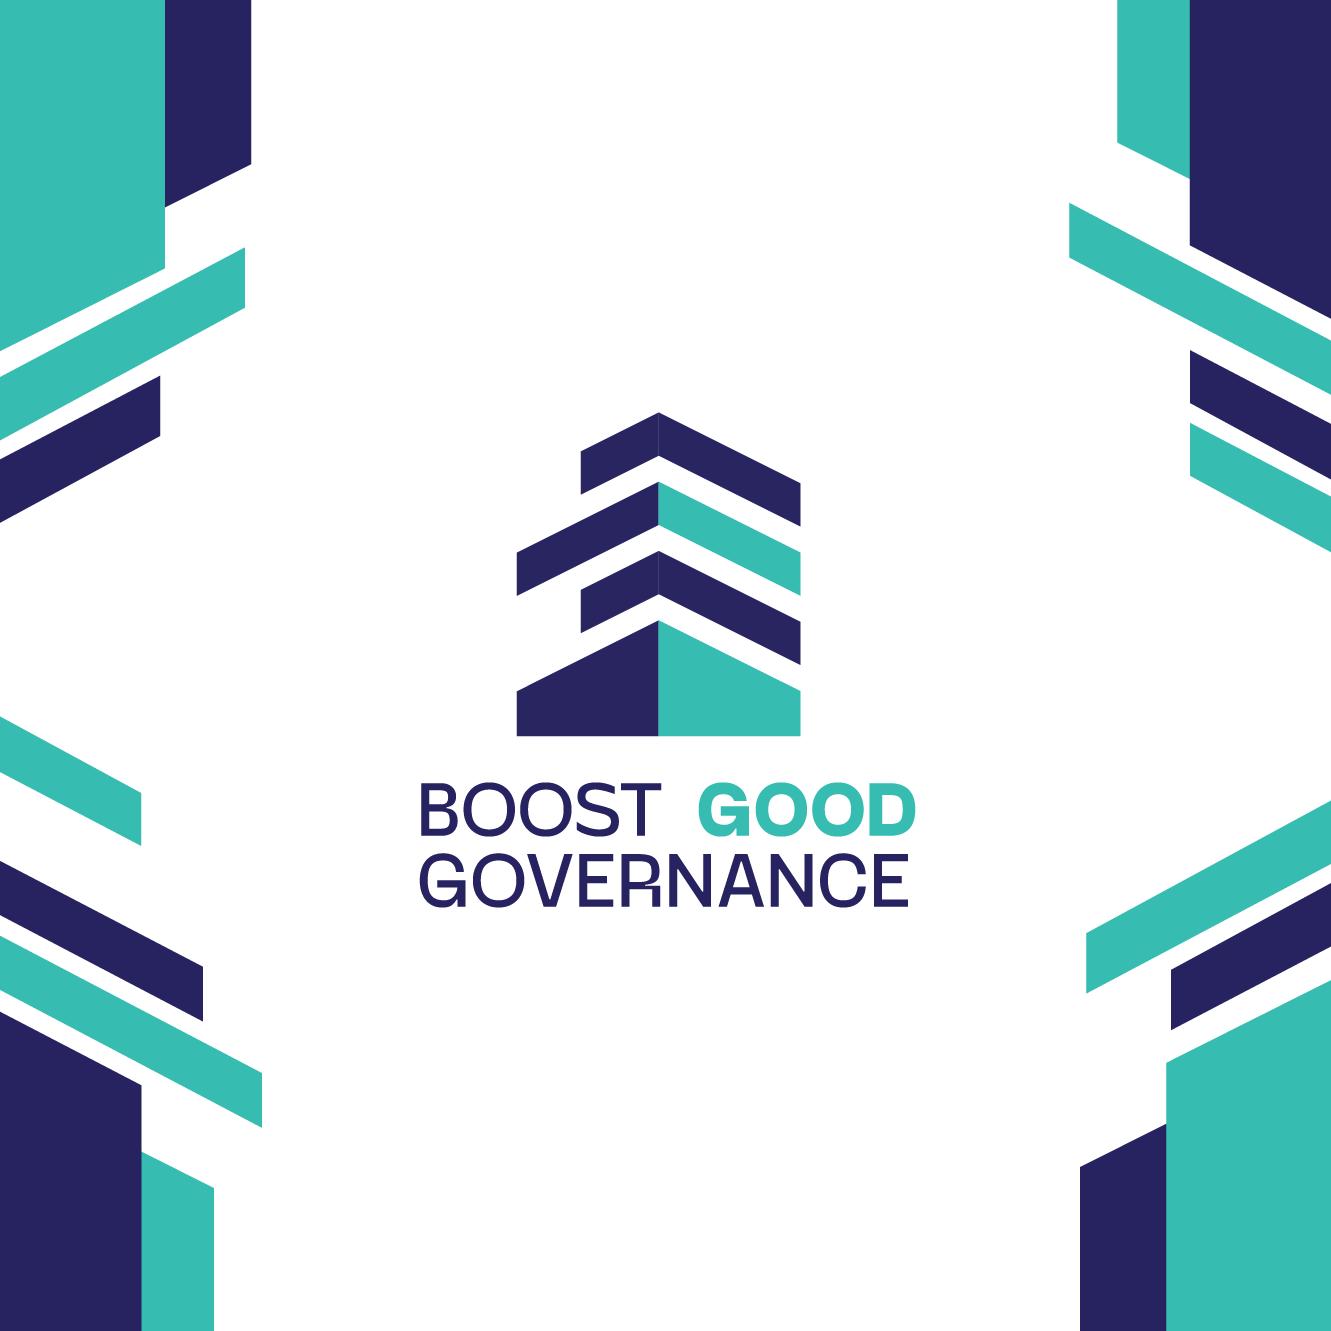 Boost Good Governance